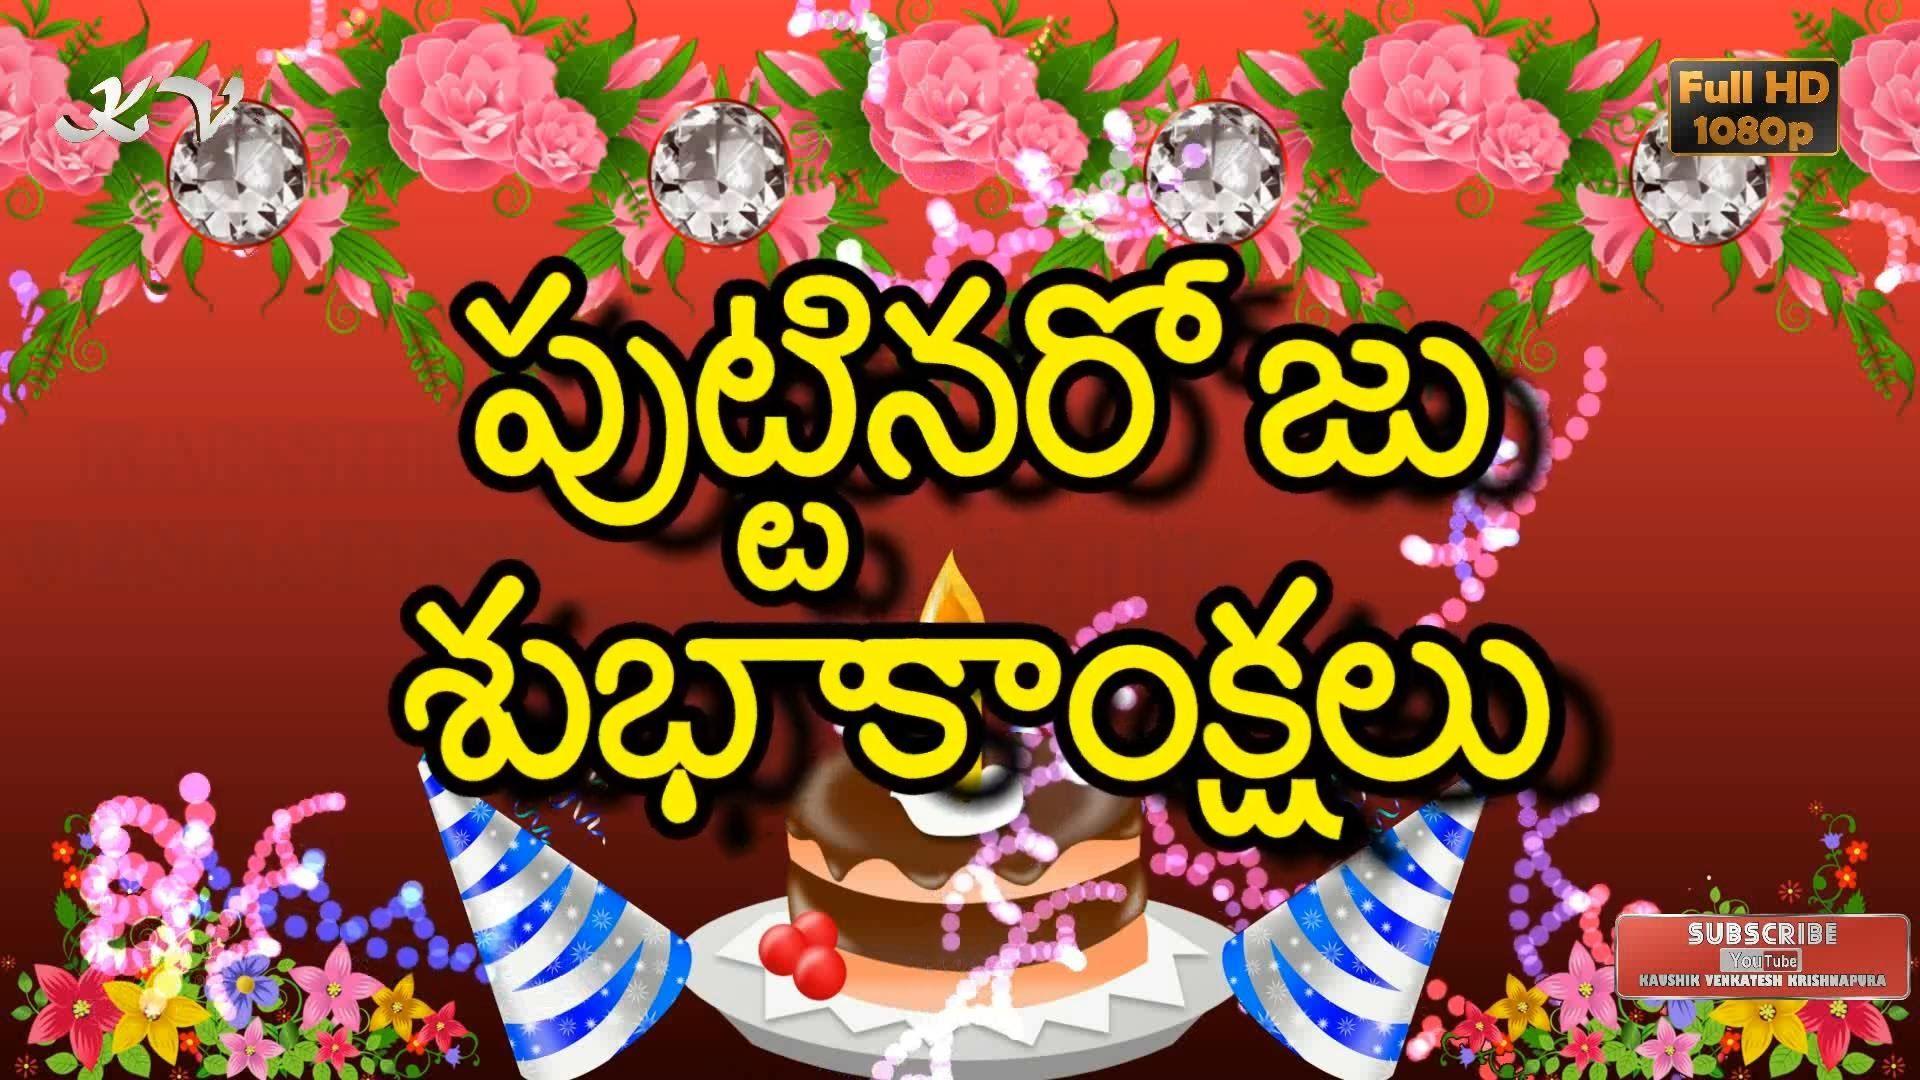 Happy Birthday in Telugu Telugu Quotes Telugu SMS Birthday – Telugu Birthday Greetings